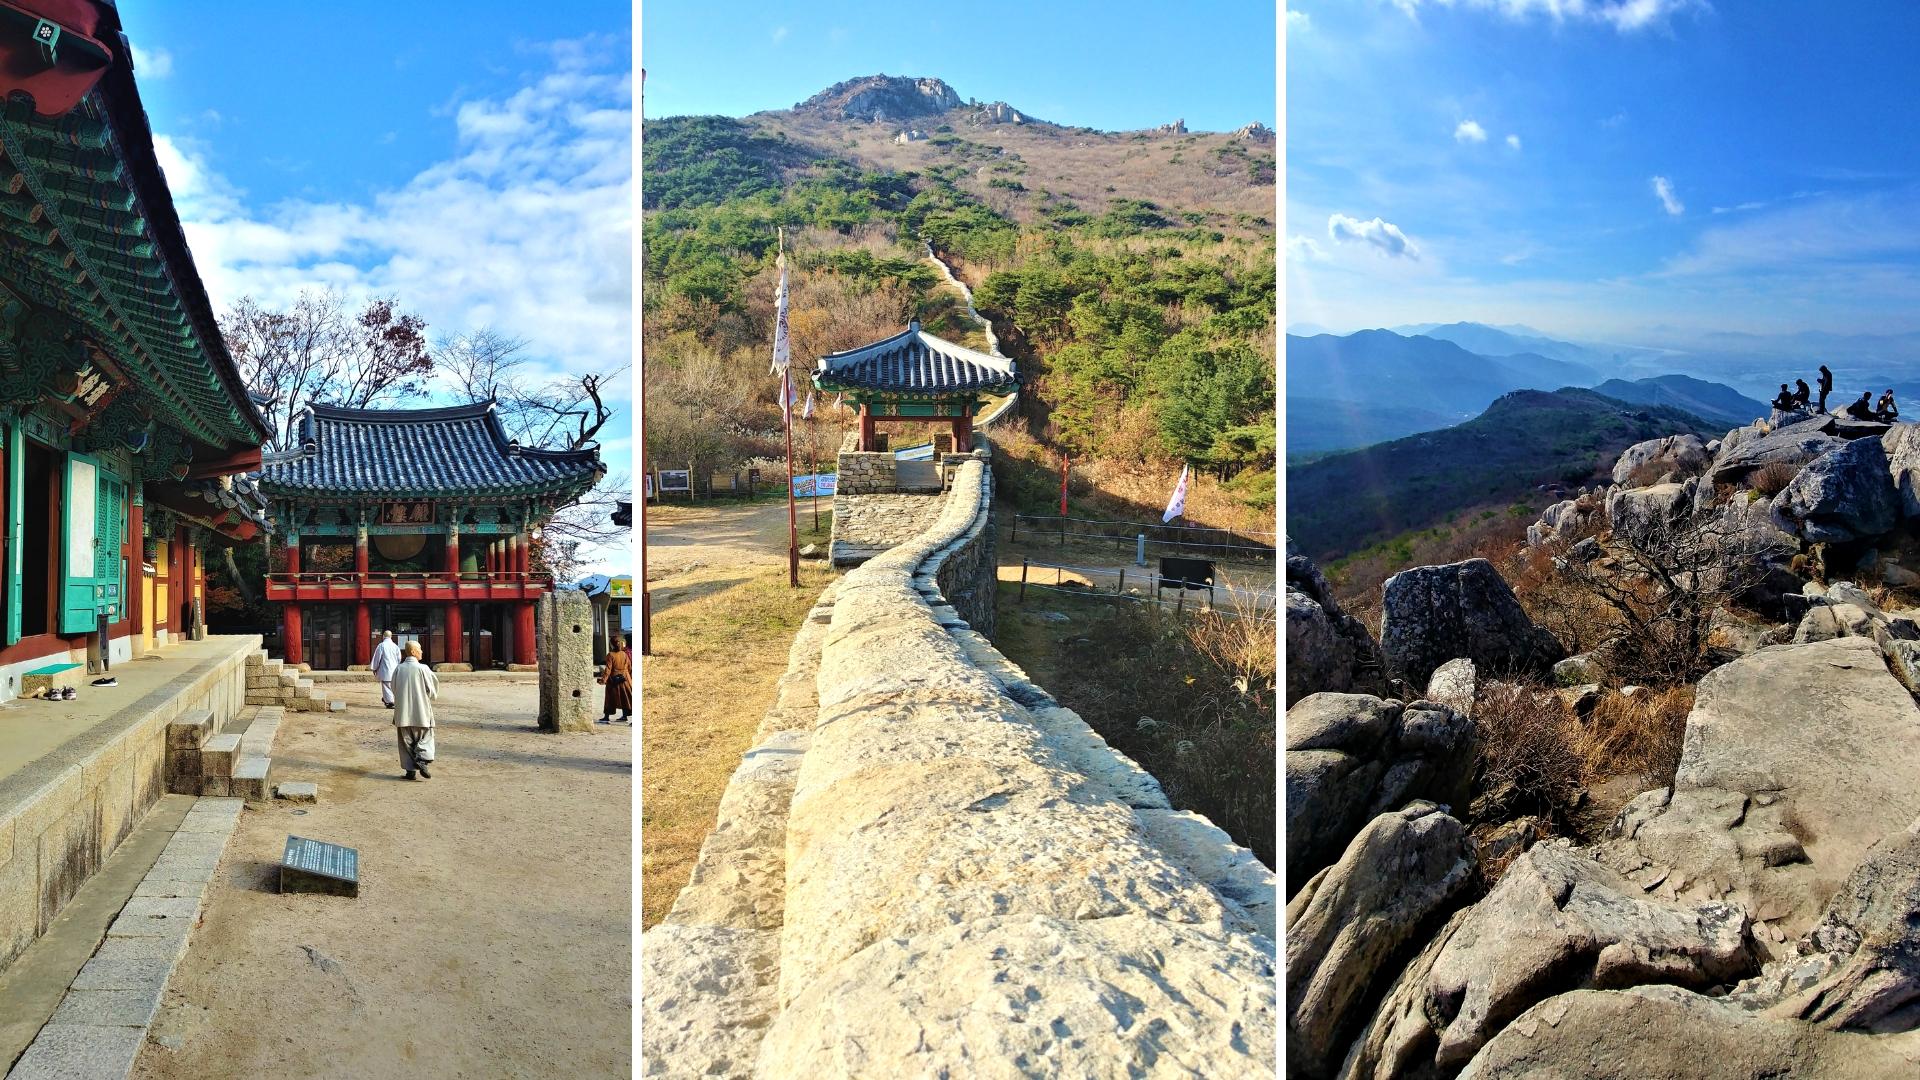 busan temple beomeosa mont Geumjeongsan randonee visite templestay blog voyage coree du sud arpenter le chemin